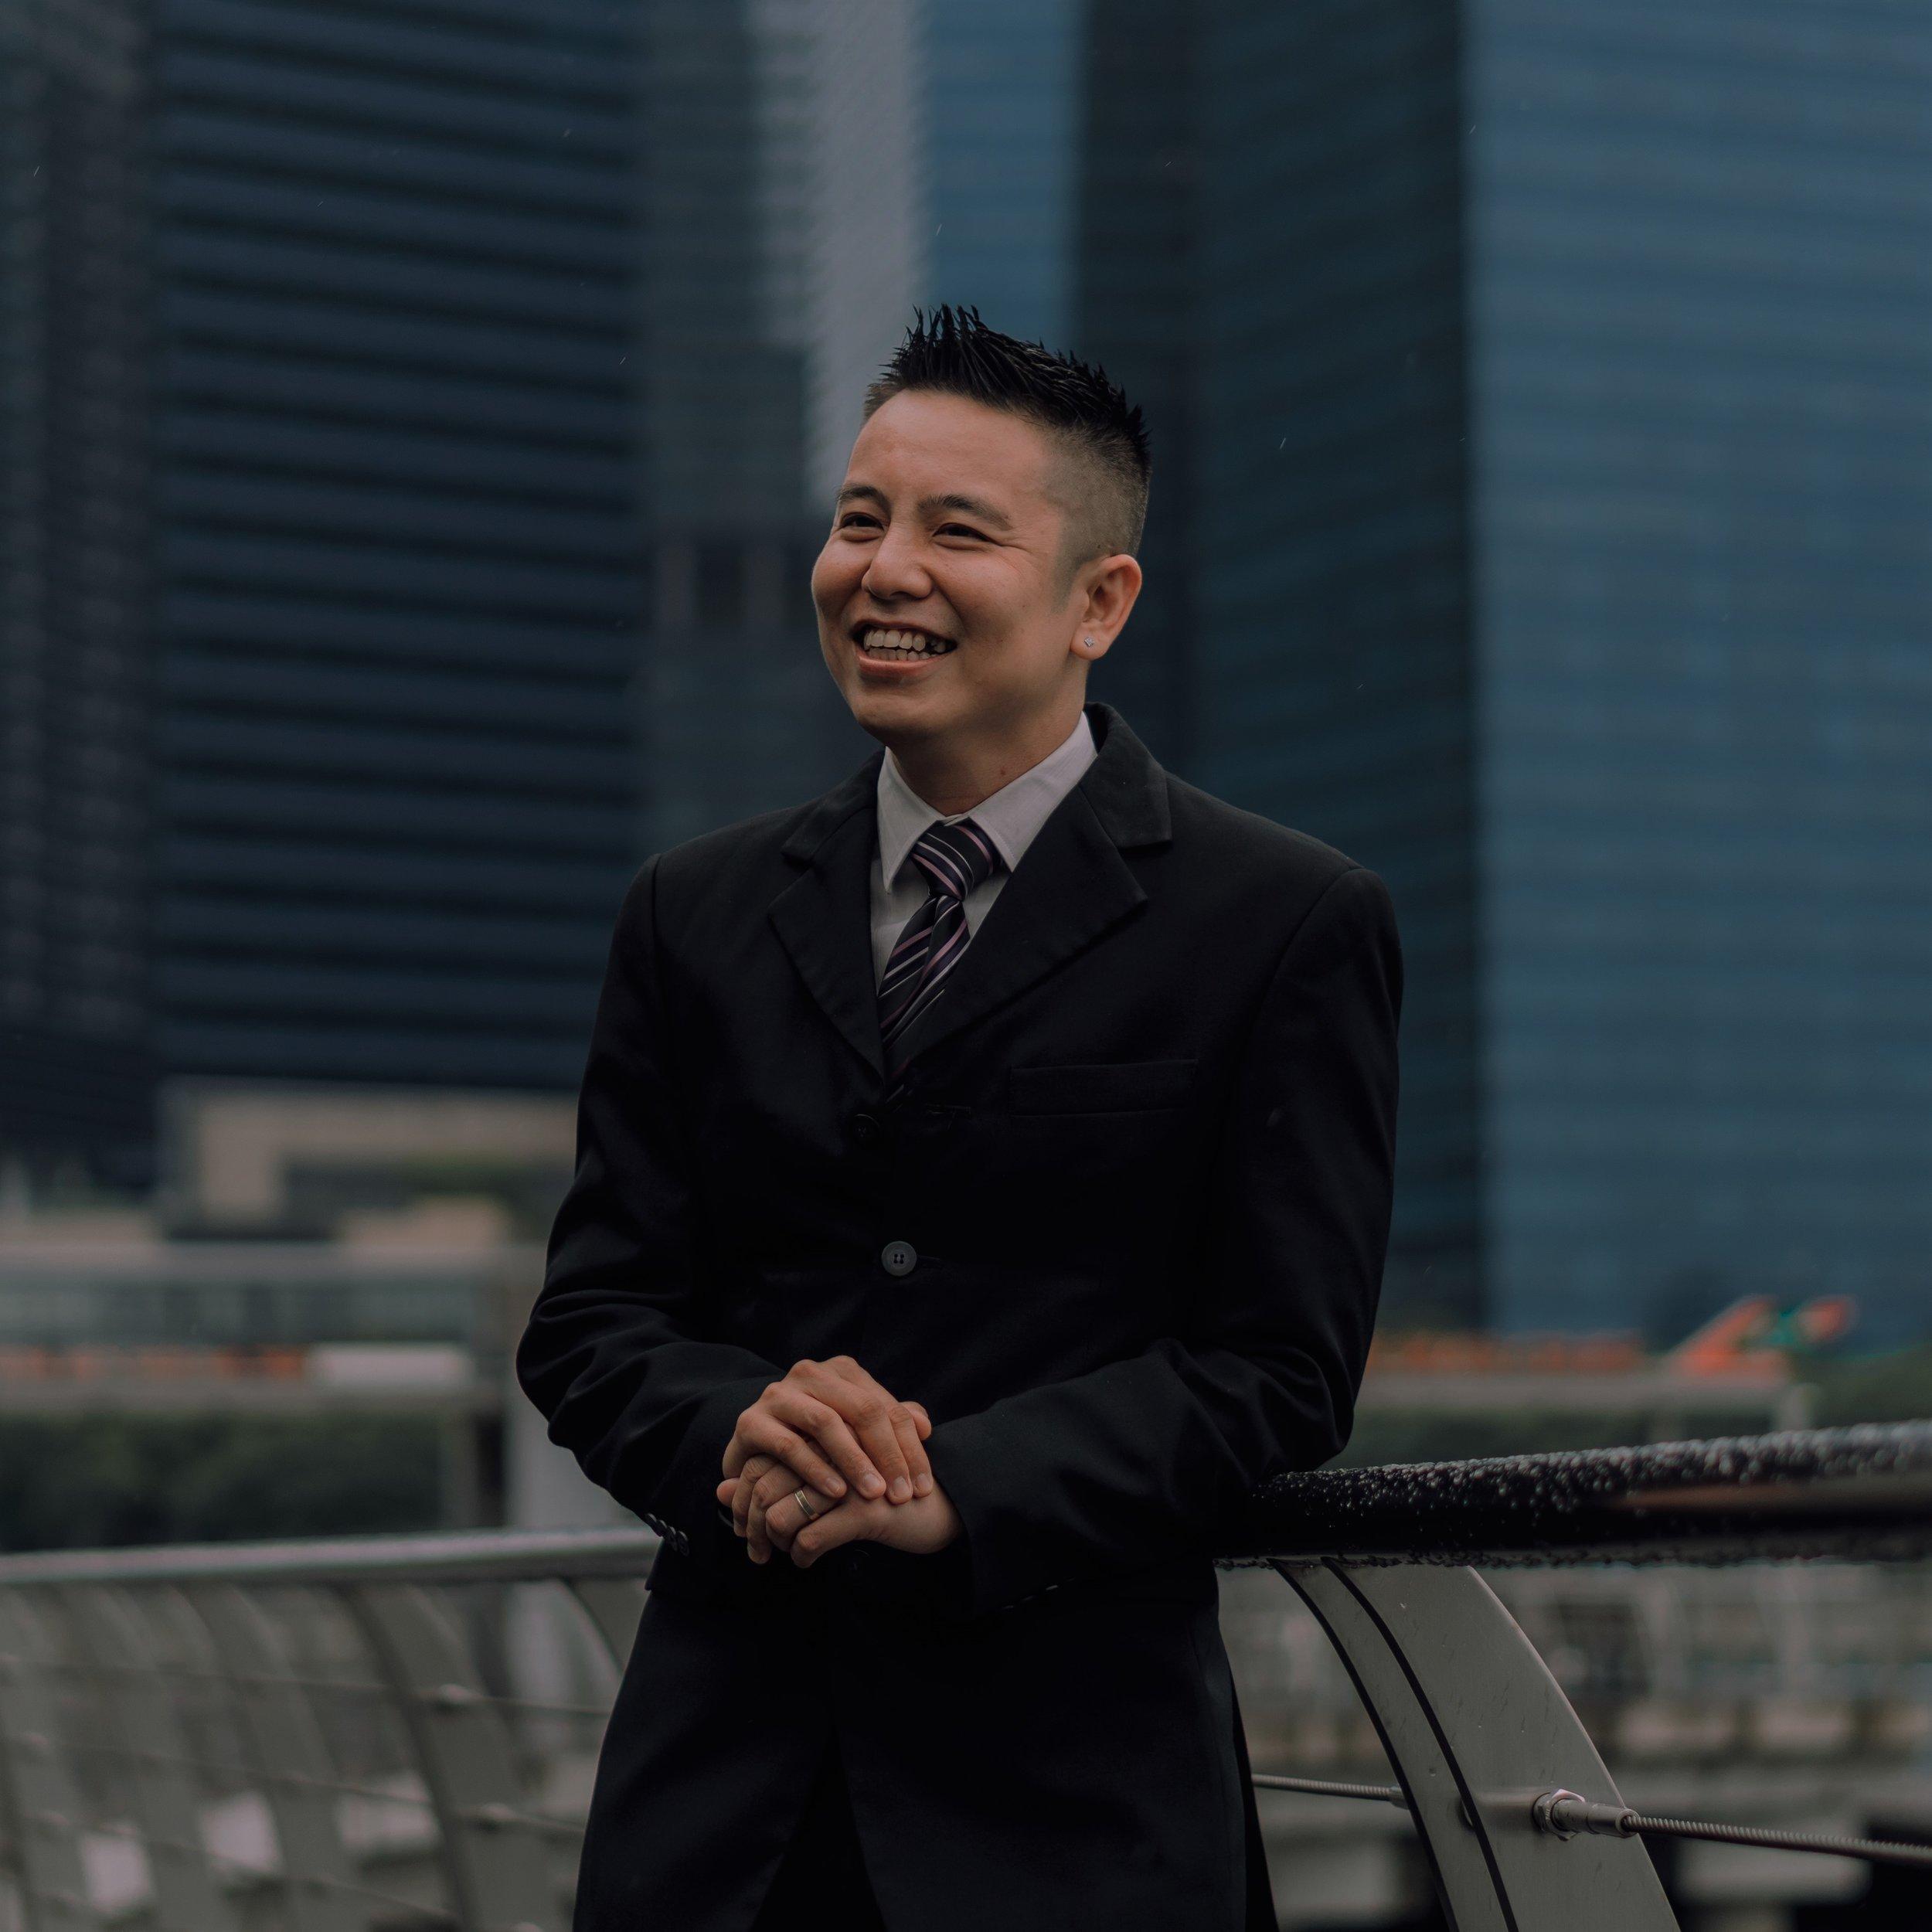 ITC Corporate Portraits -